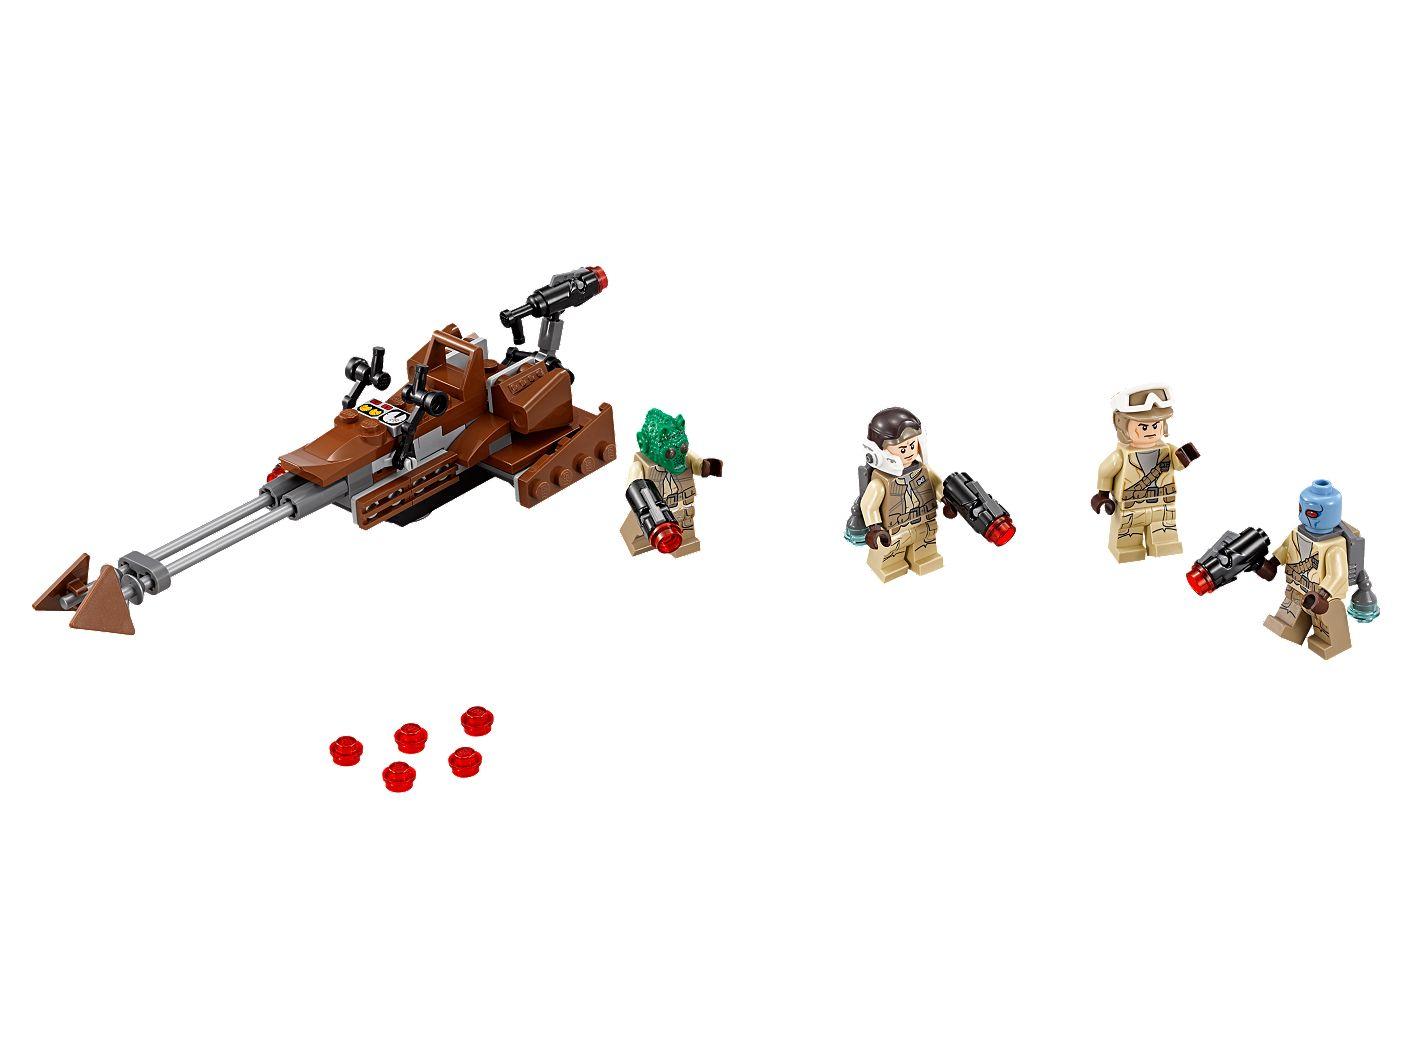 LEGO STAR WARS  MINIFIGURA REBEL TROOPER MODEL III SET 75133 ORIGINAL MINIFIGURE